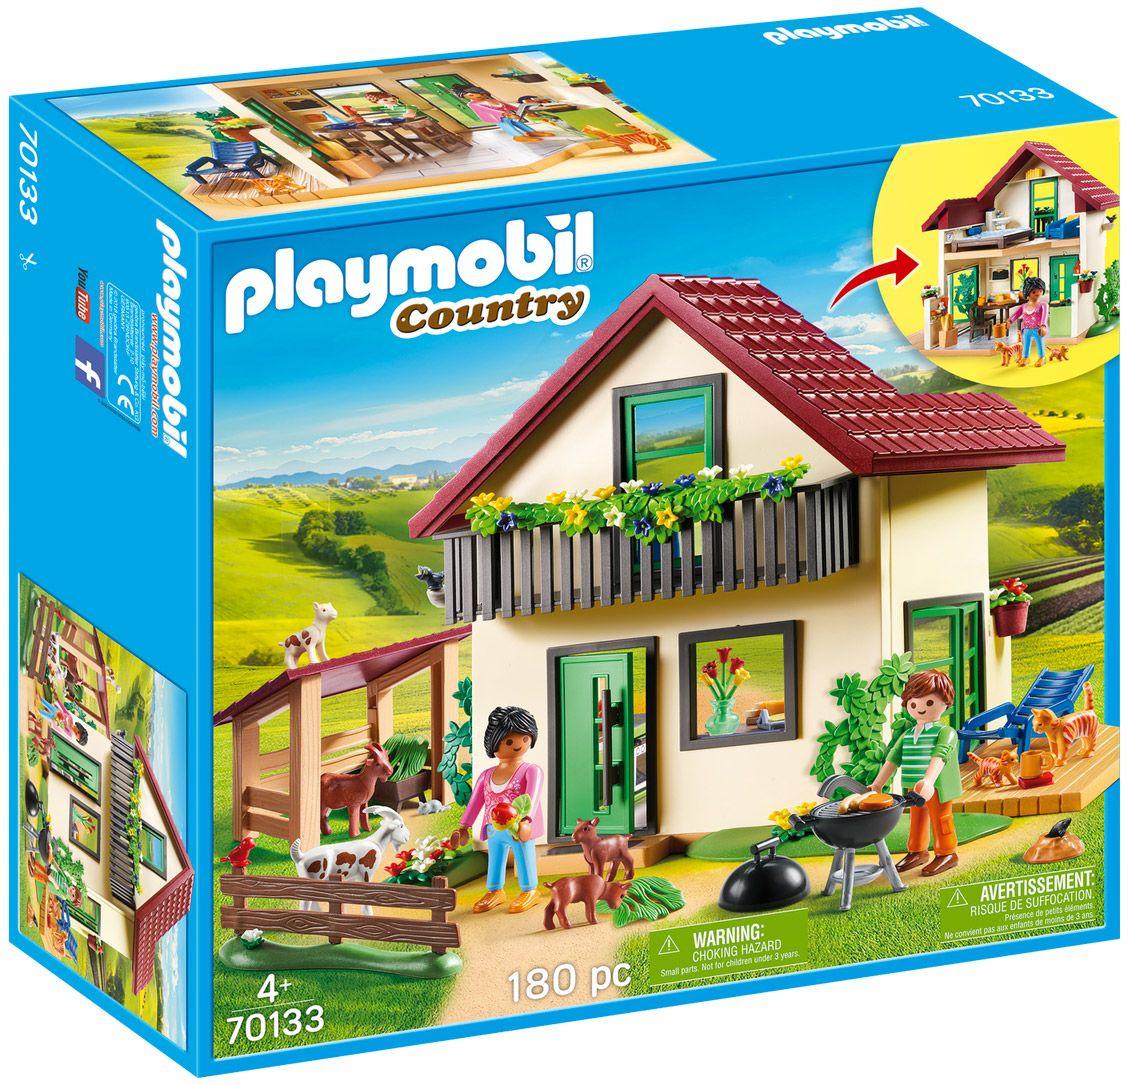 Épinglé Par Koupobol Sur Playmobil Country   Playmobil ... tout Grand Jardin D Enfant Playmobil